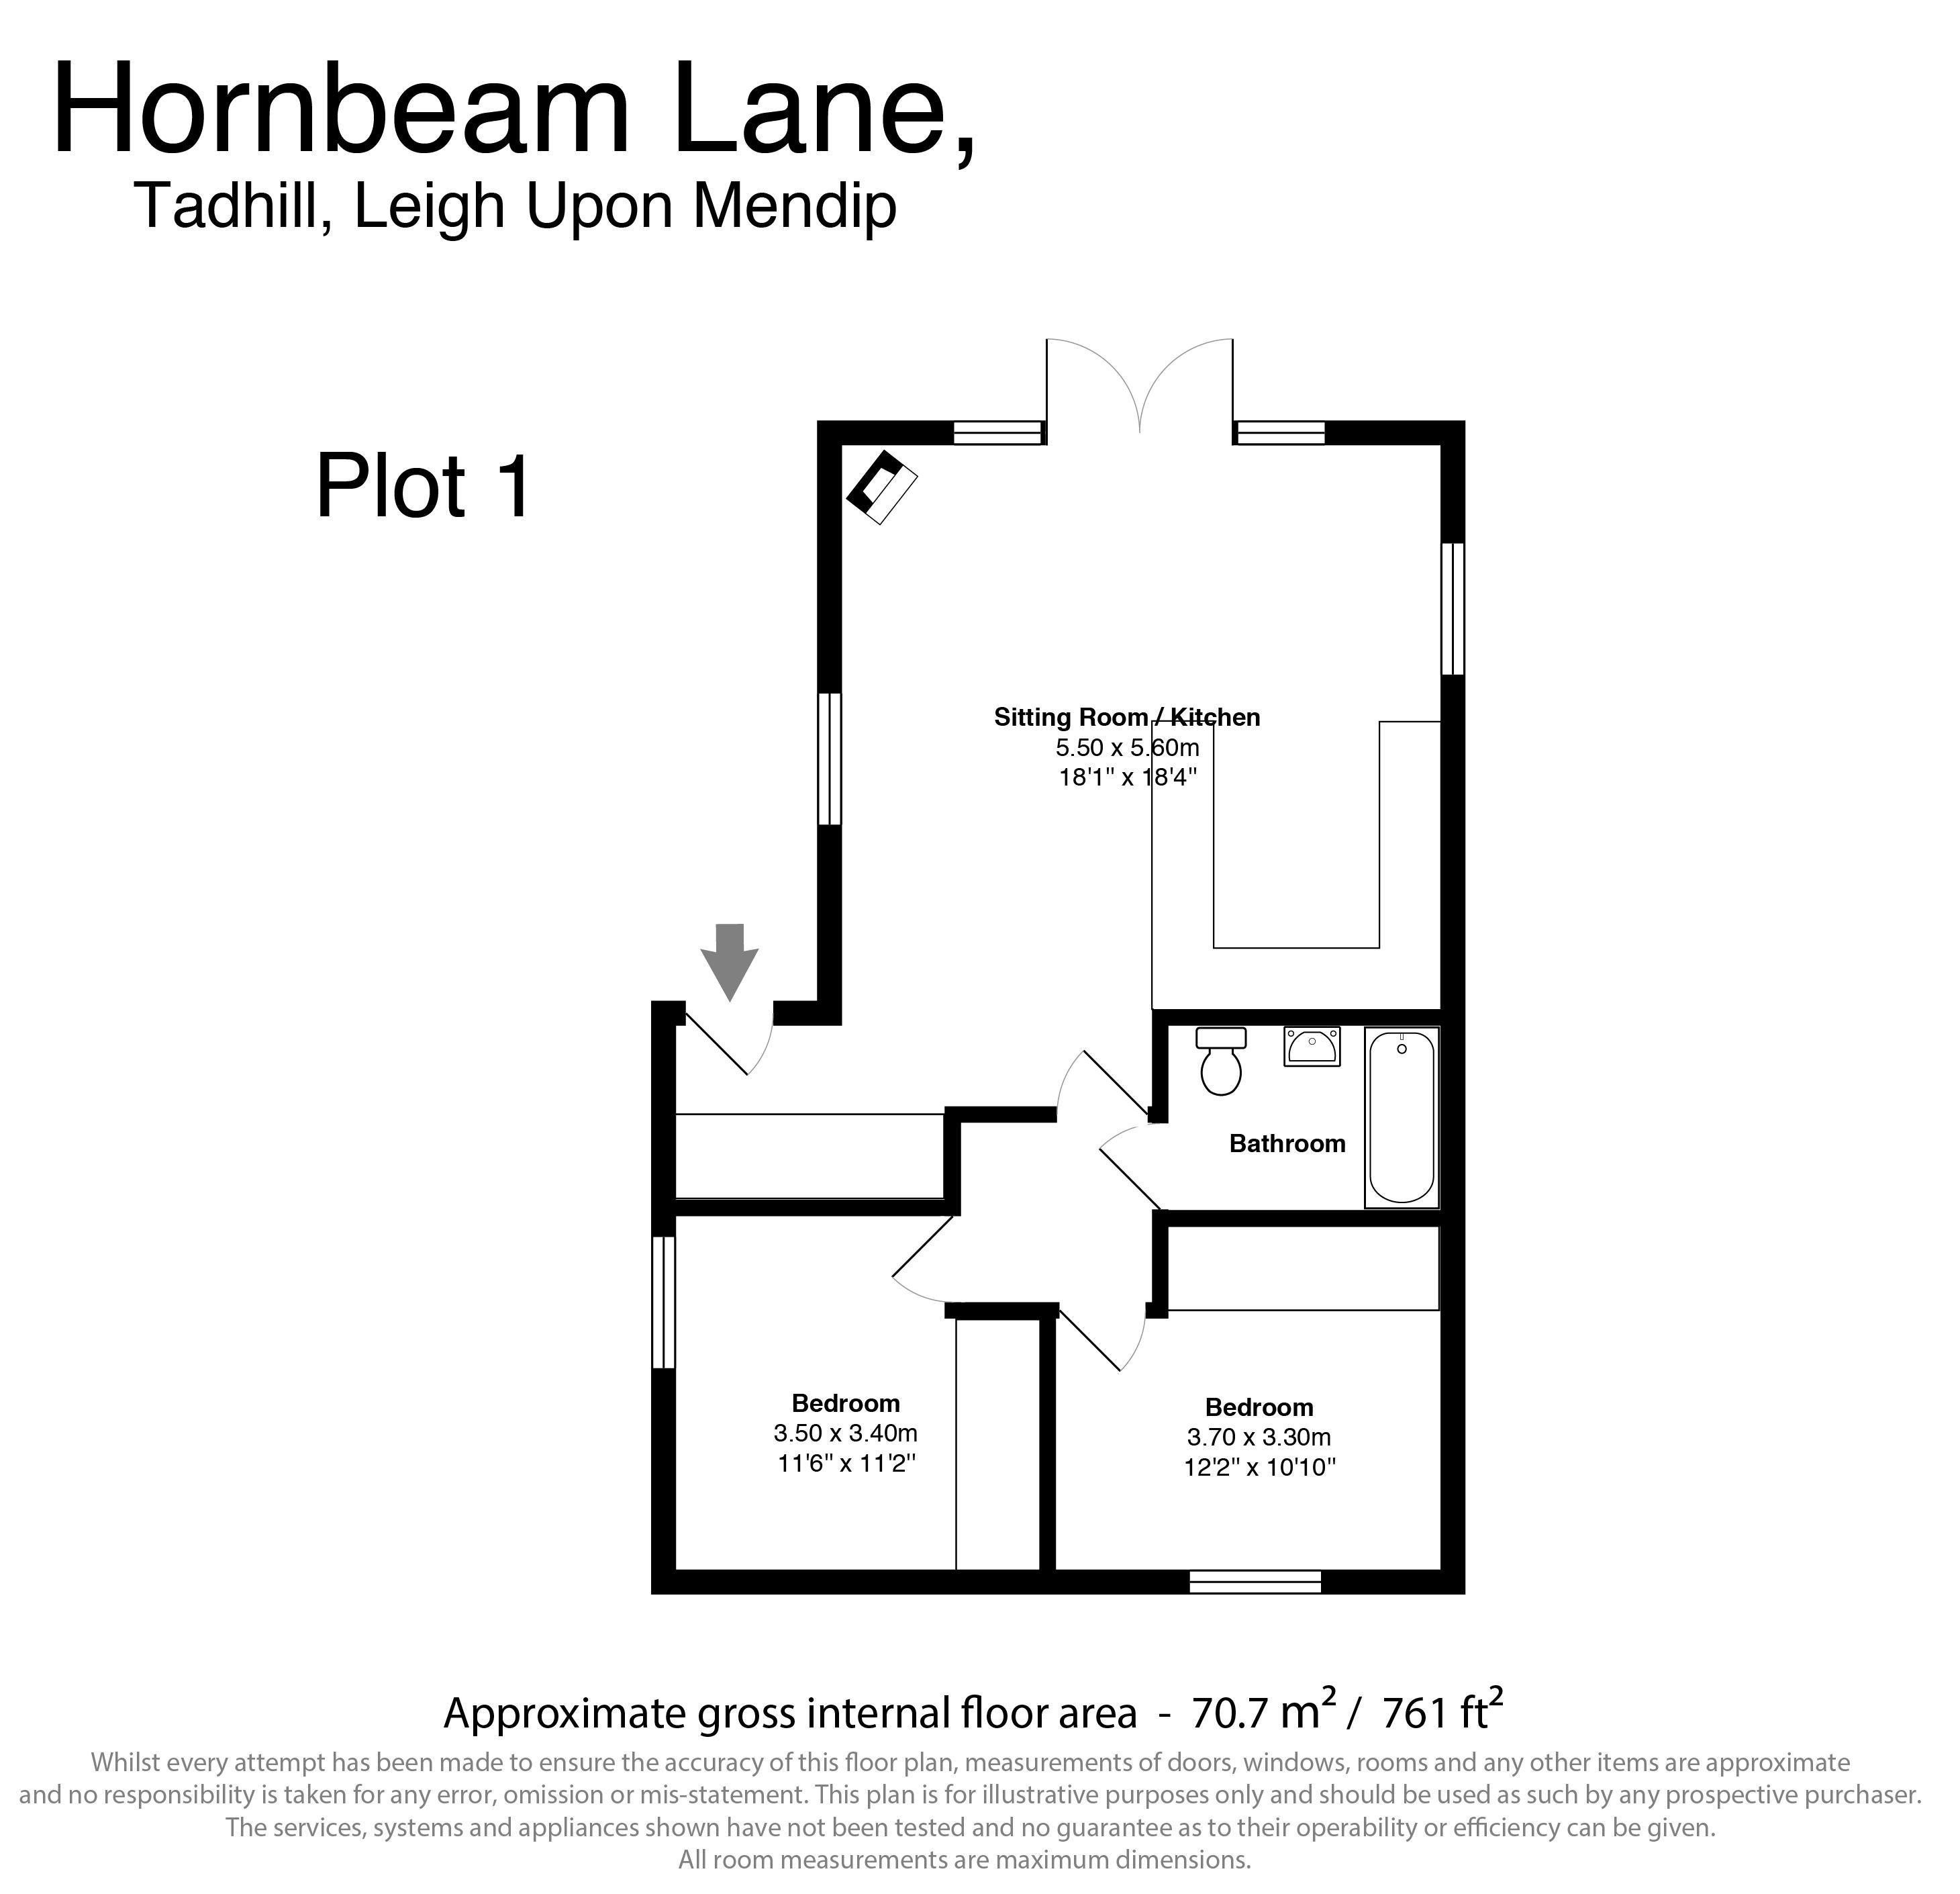 Hornbeam Lane Leigh upon Mendip